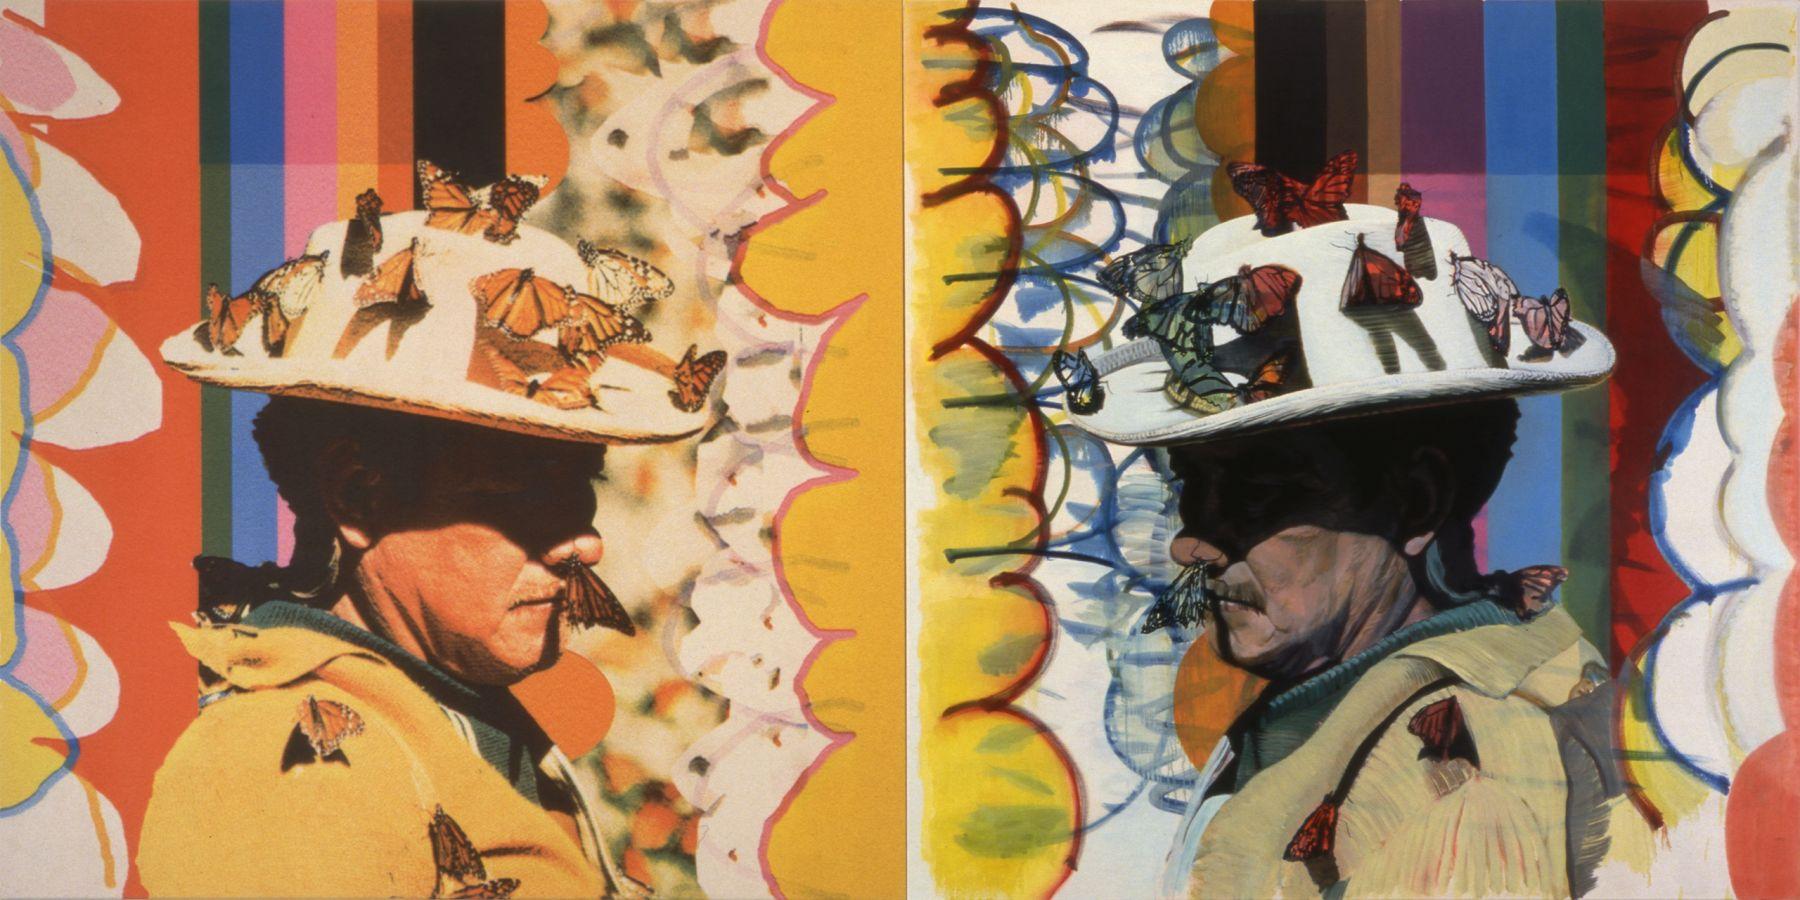 18. God Dog, 1997-1998, acrylic/tempera/oil/print/canvas, 200 x 400 cm